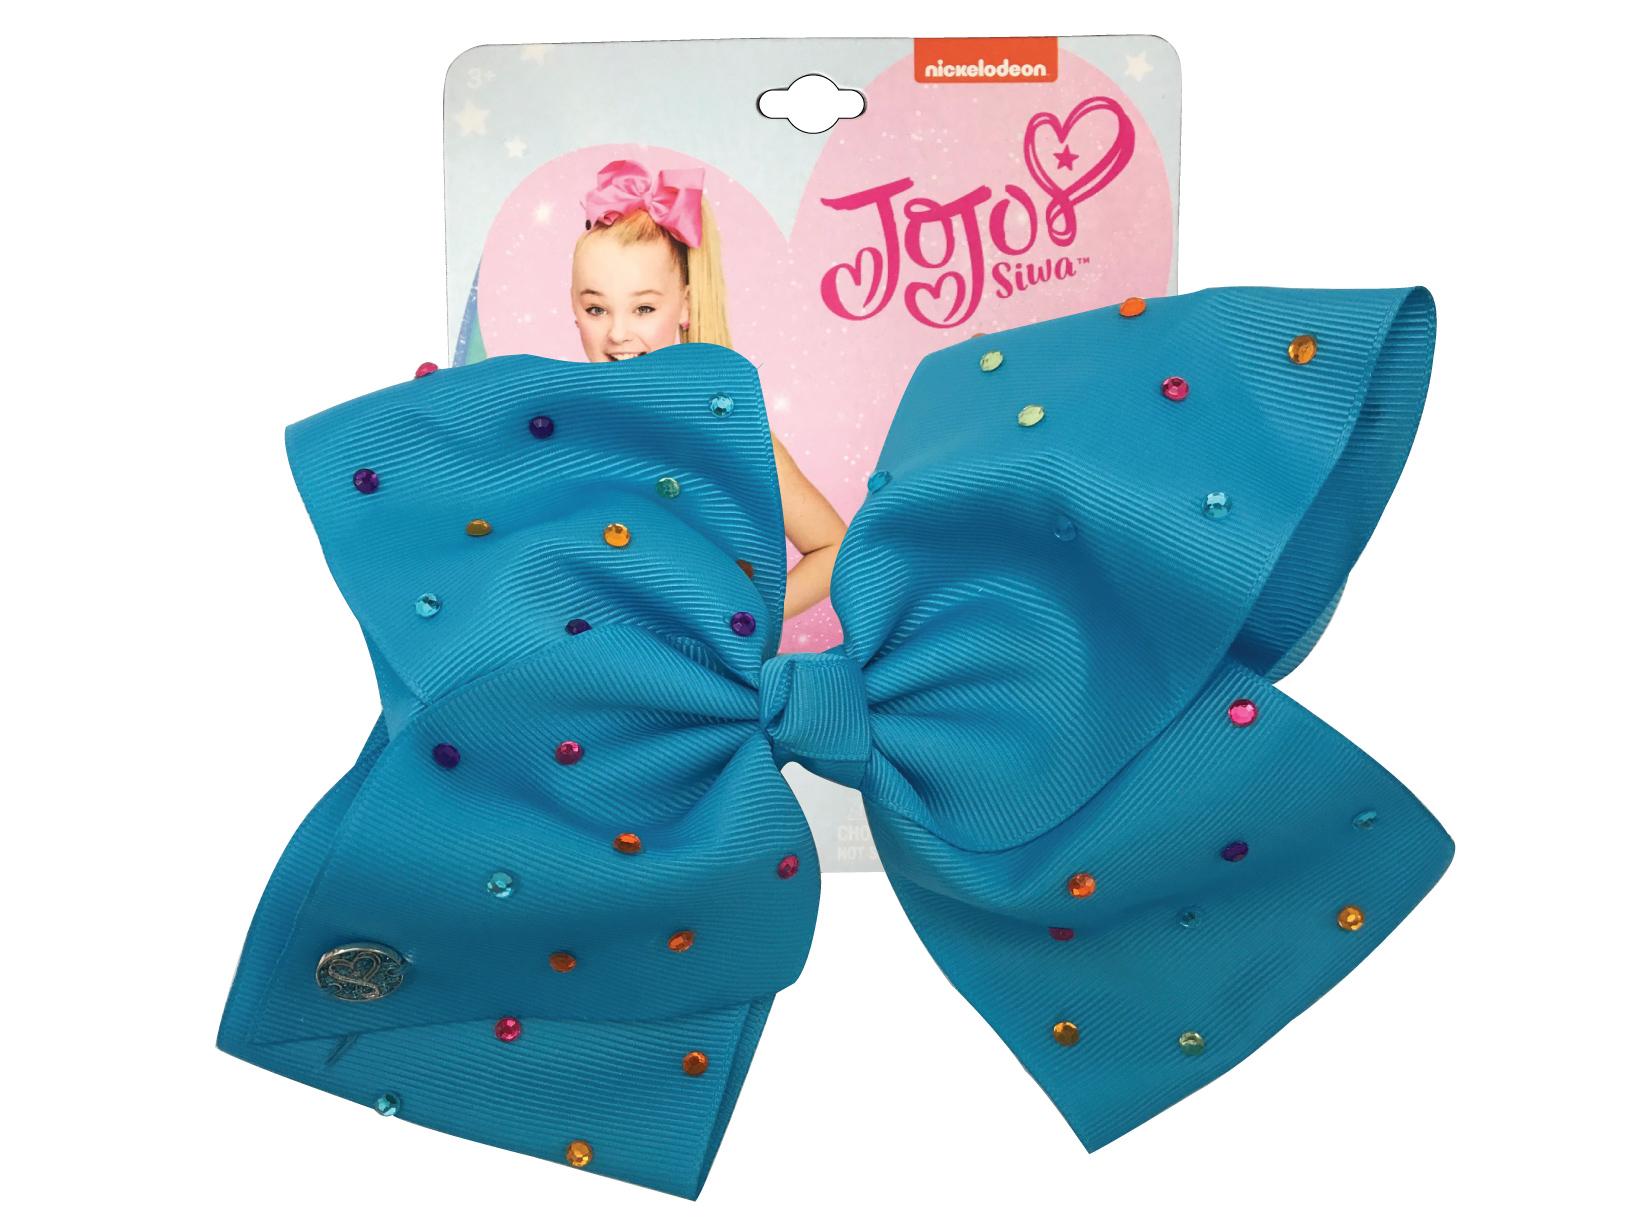 JoJo Siwa Large Cheer Hair Bow (Turquoise w/Colored Rhinestones)